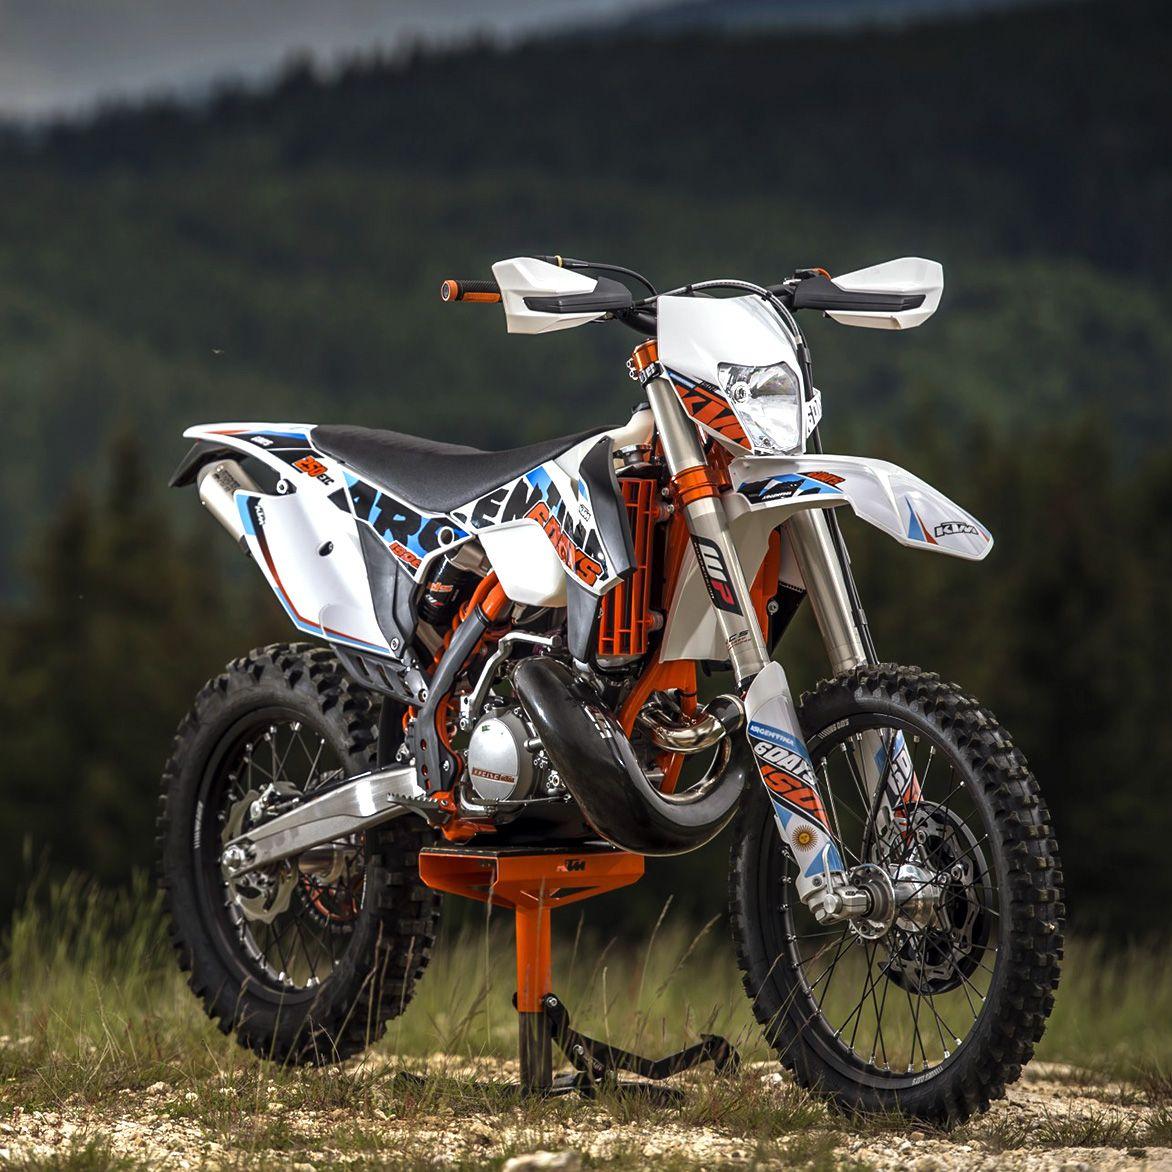 KTM 500 EXC Ktm dirt bikes, Ktm